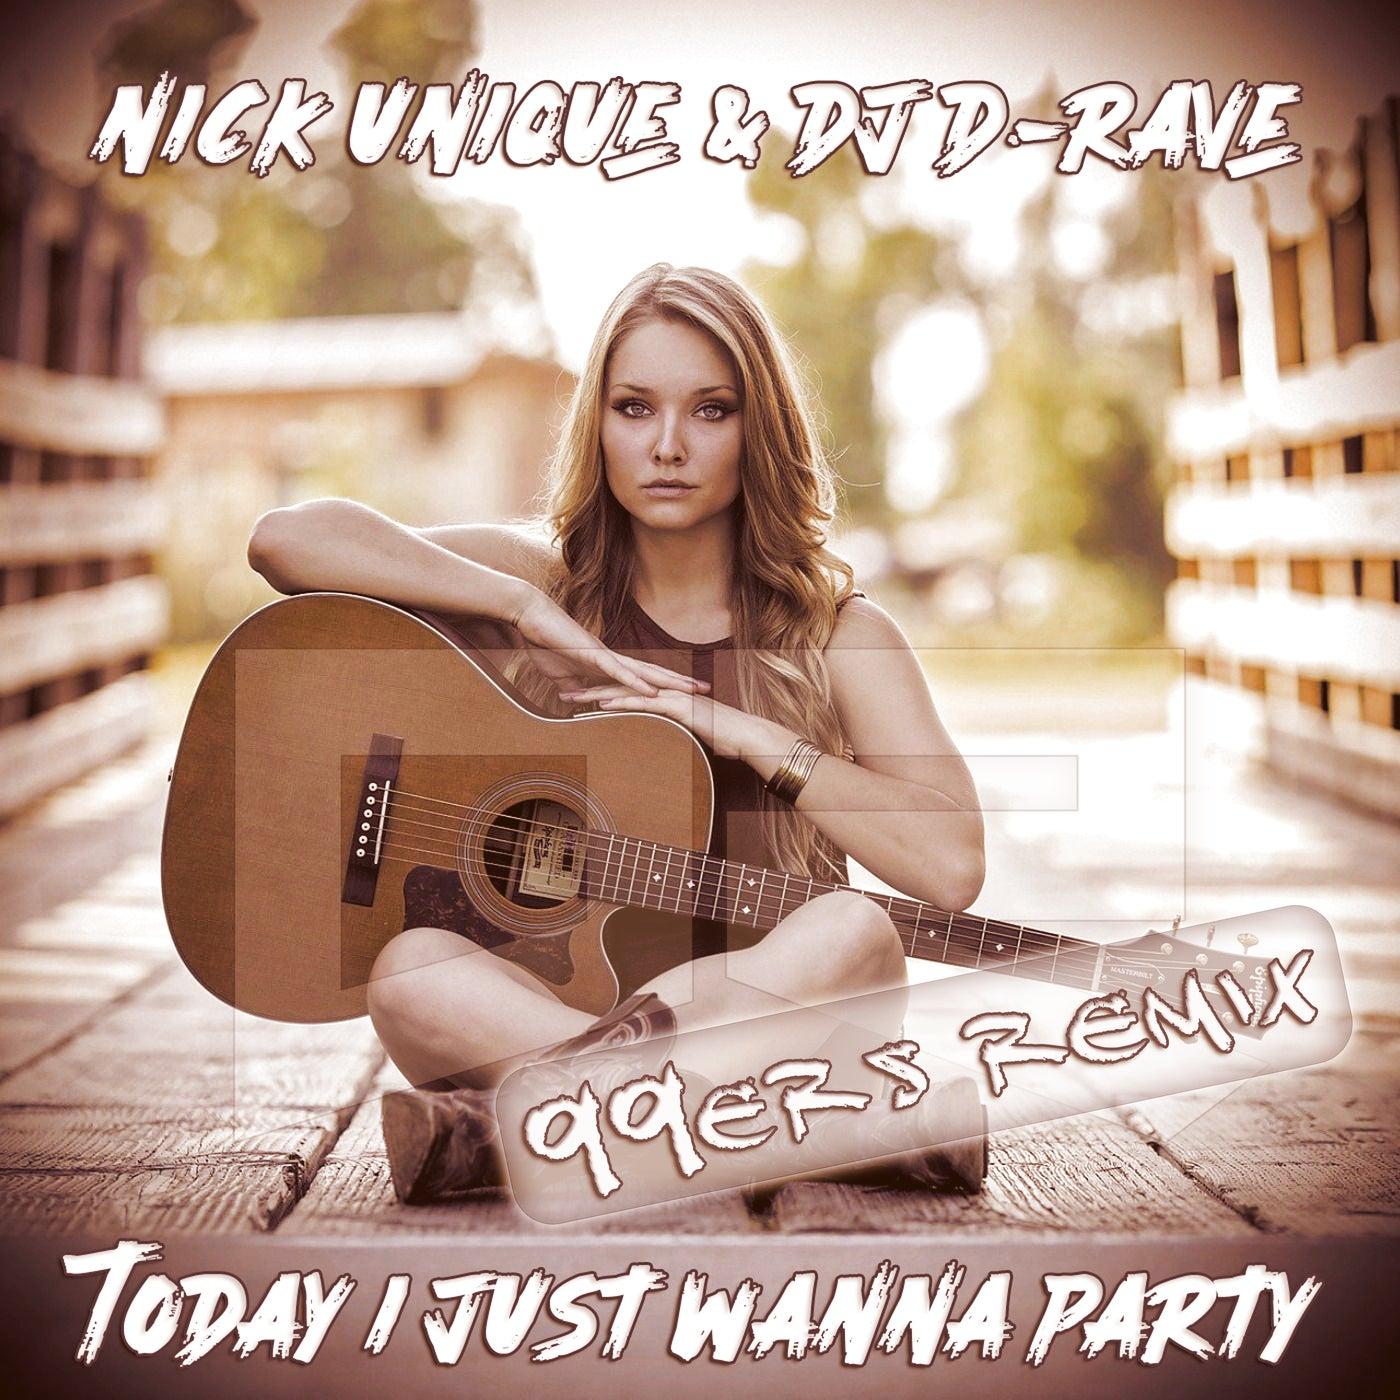 Nick Unique & DJ D-Rave - Today I Just Wanna Party (99ers Remix)